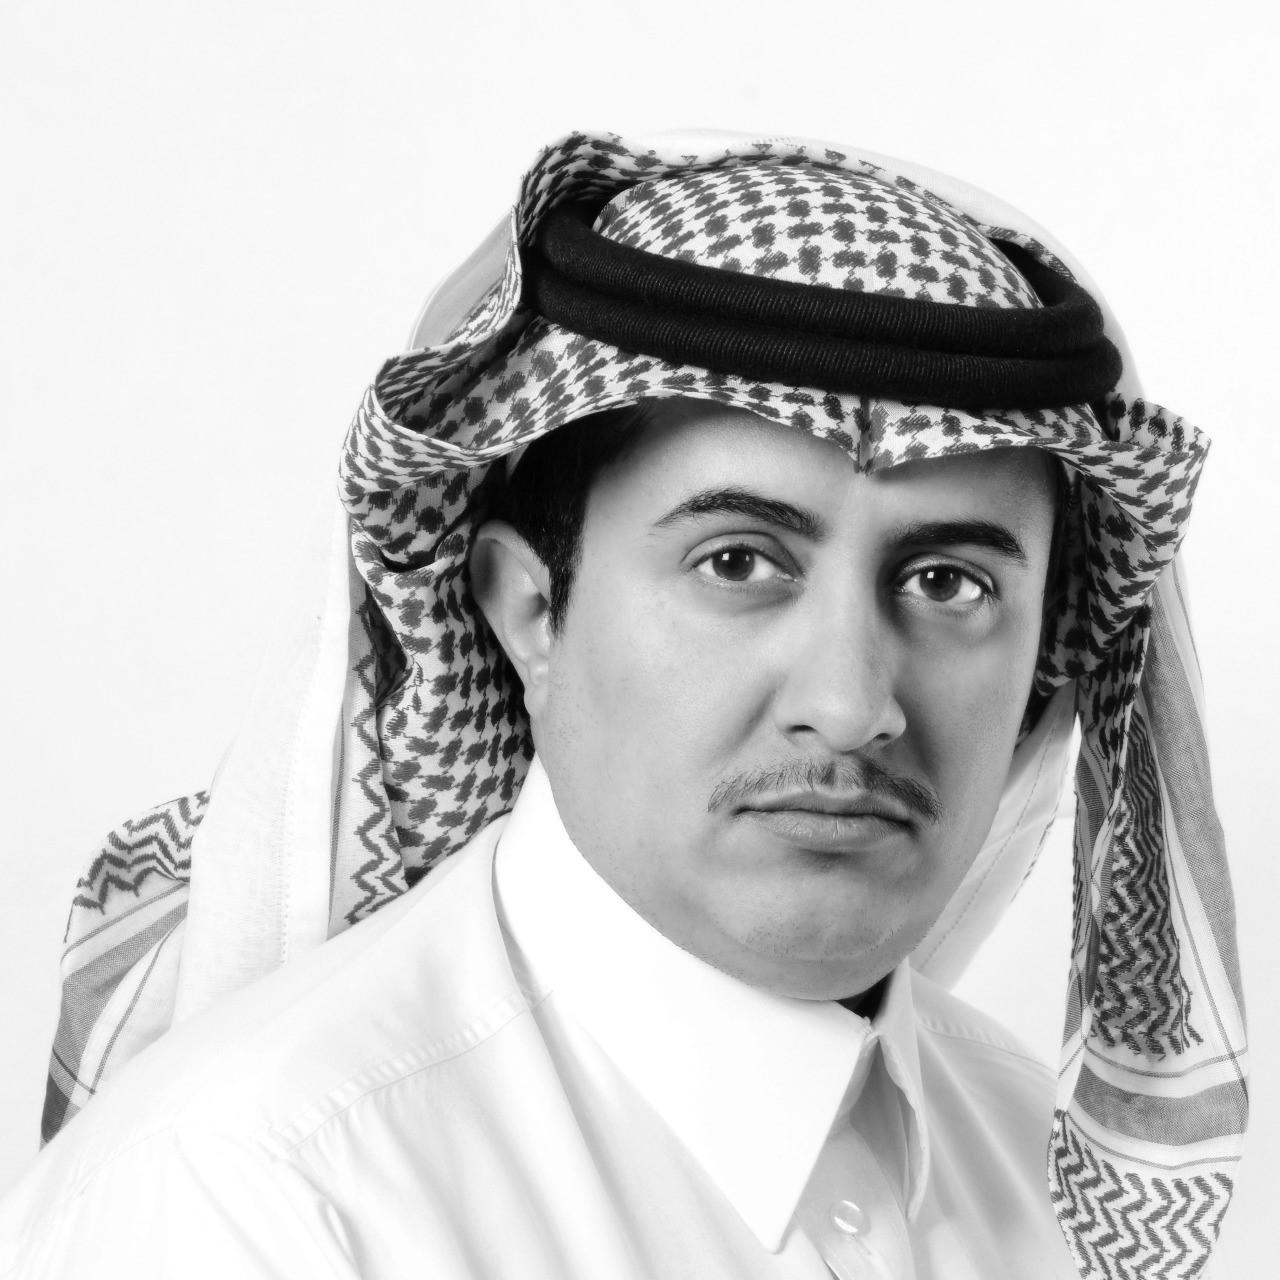 محمد صالح آل شمح